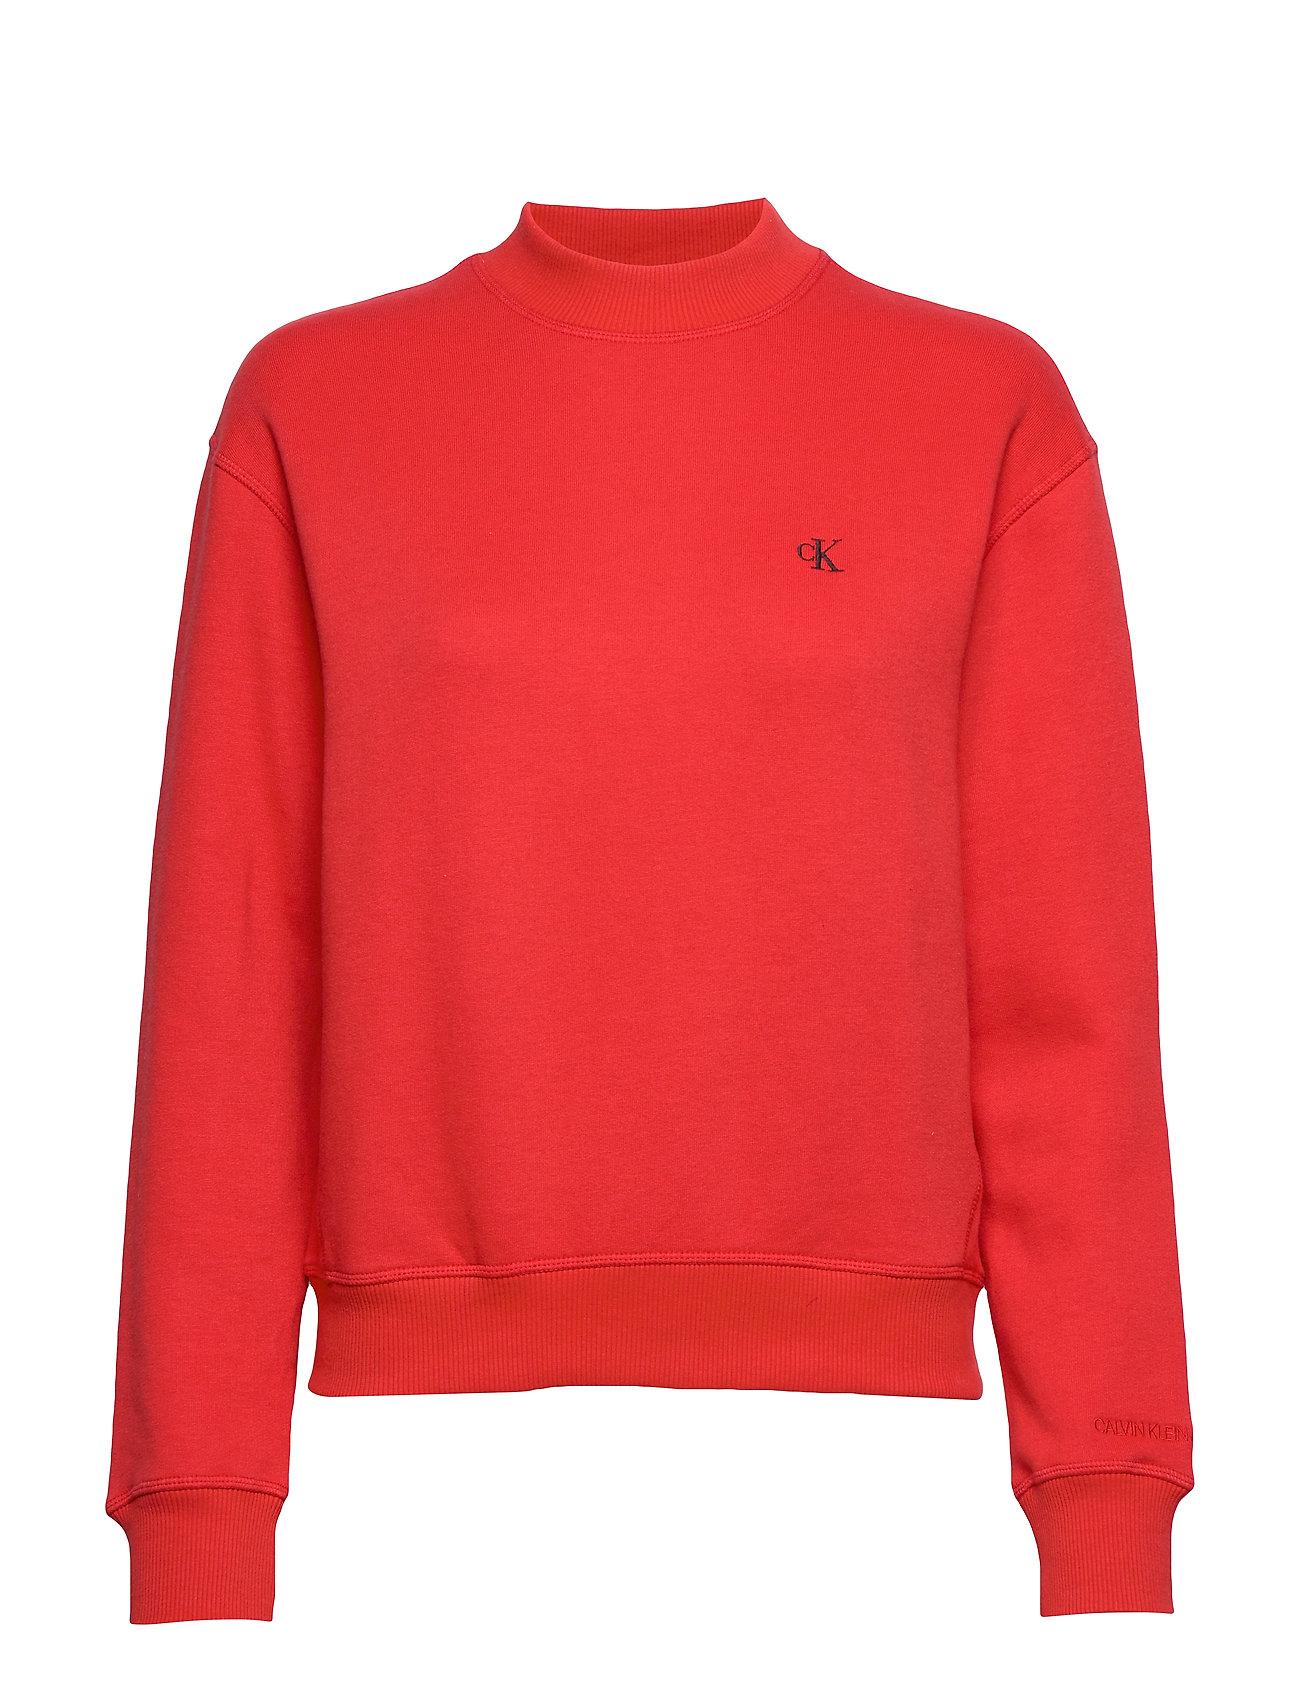 Calvin Klein Jeans CK EMBROIDERY REGULAR CREW NECK - RACING RED